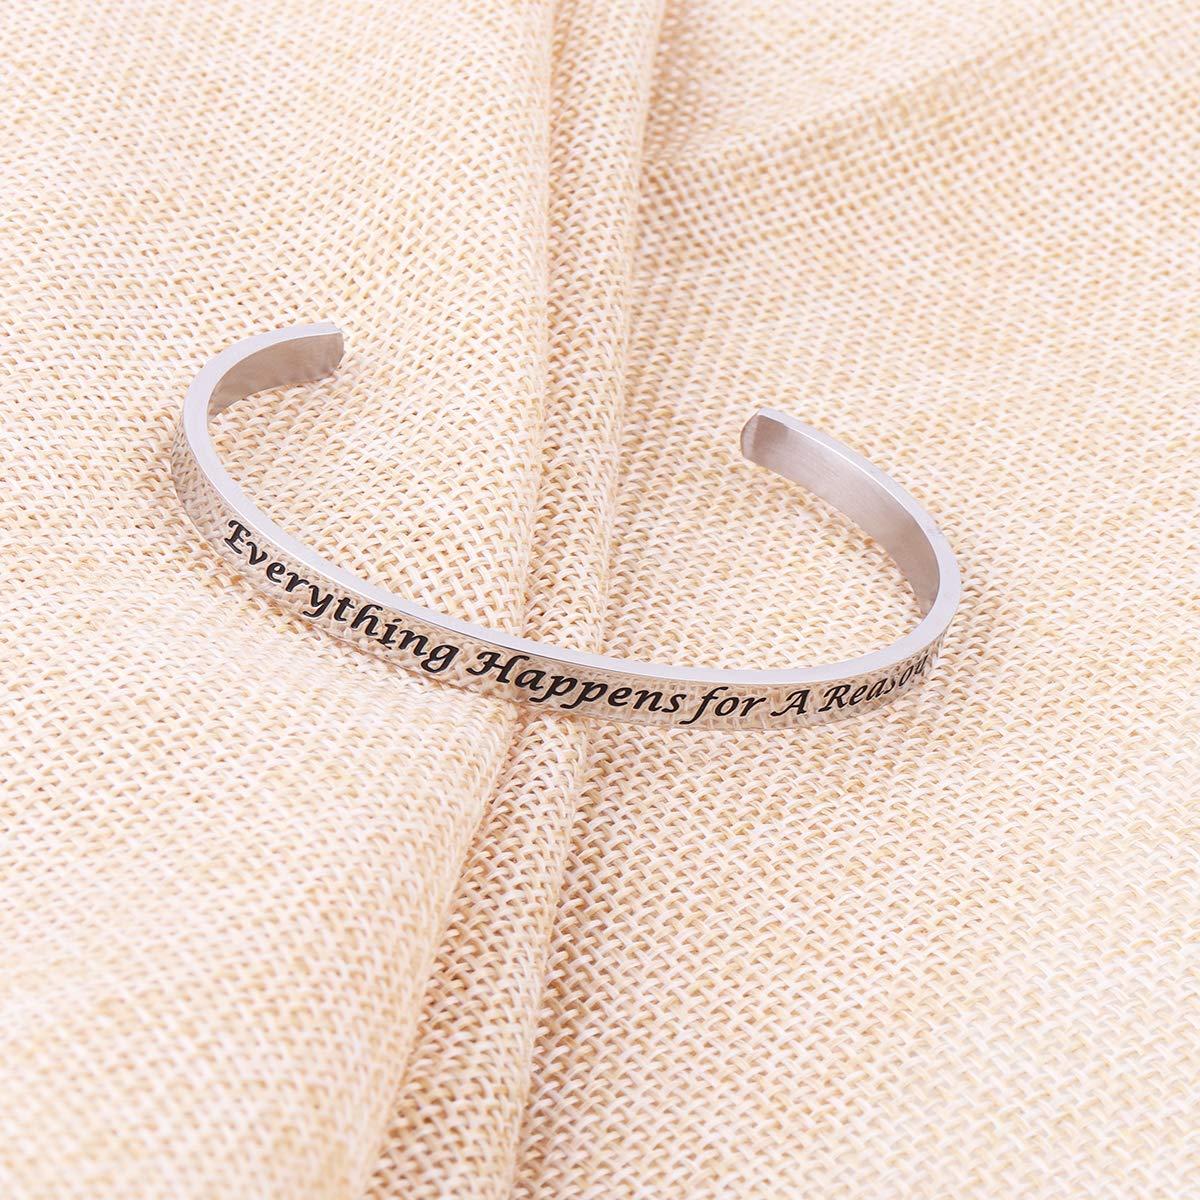 AZFEIYA Inspirational Bracelet Confidence Jewelry Motivational Cuff Bracelet Everything Happens for a Reason Encouragement Bracelet Personalized Birthday Gift (Silver Bracelet) by AZFEIYA (Image #4)